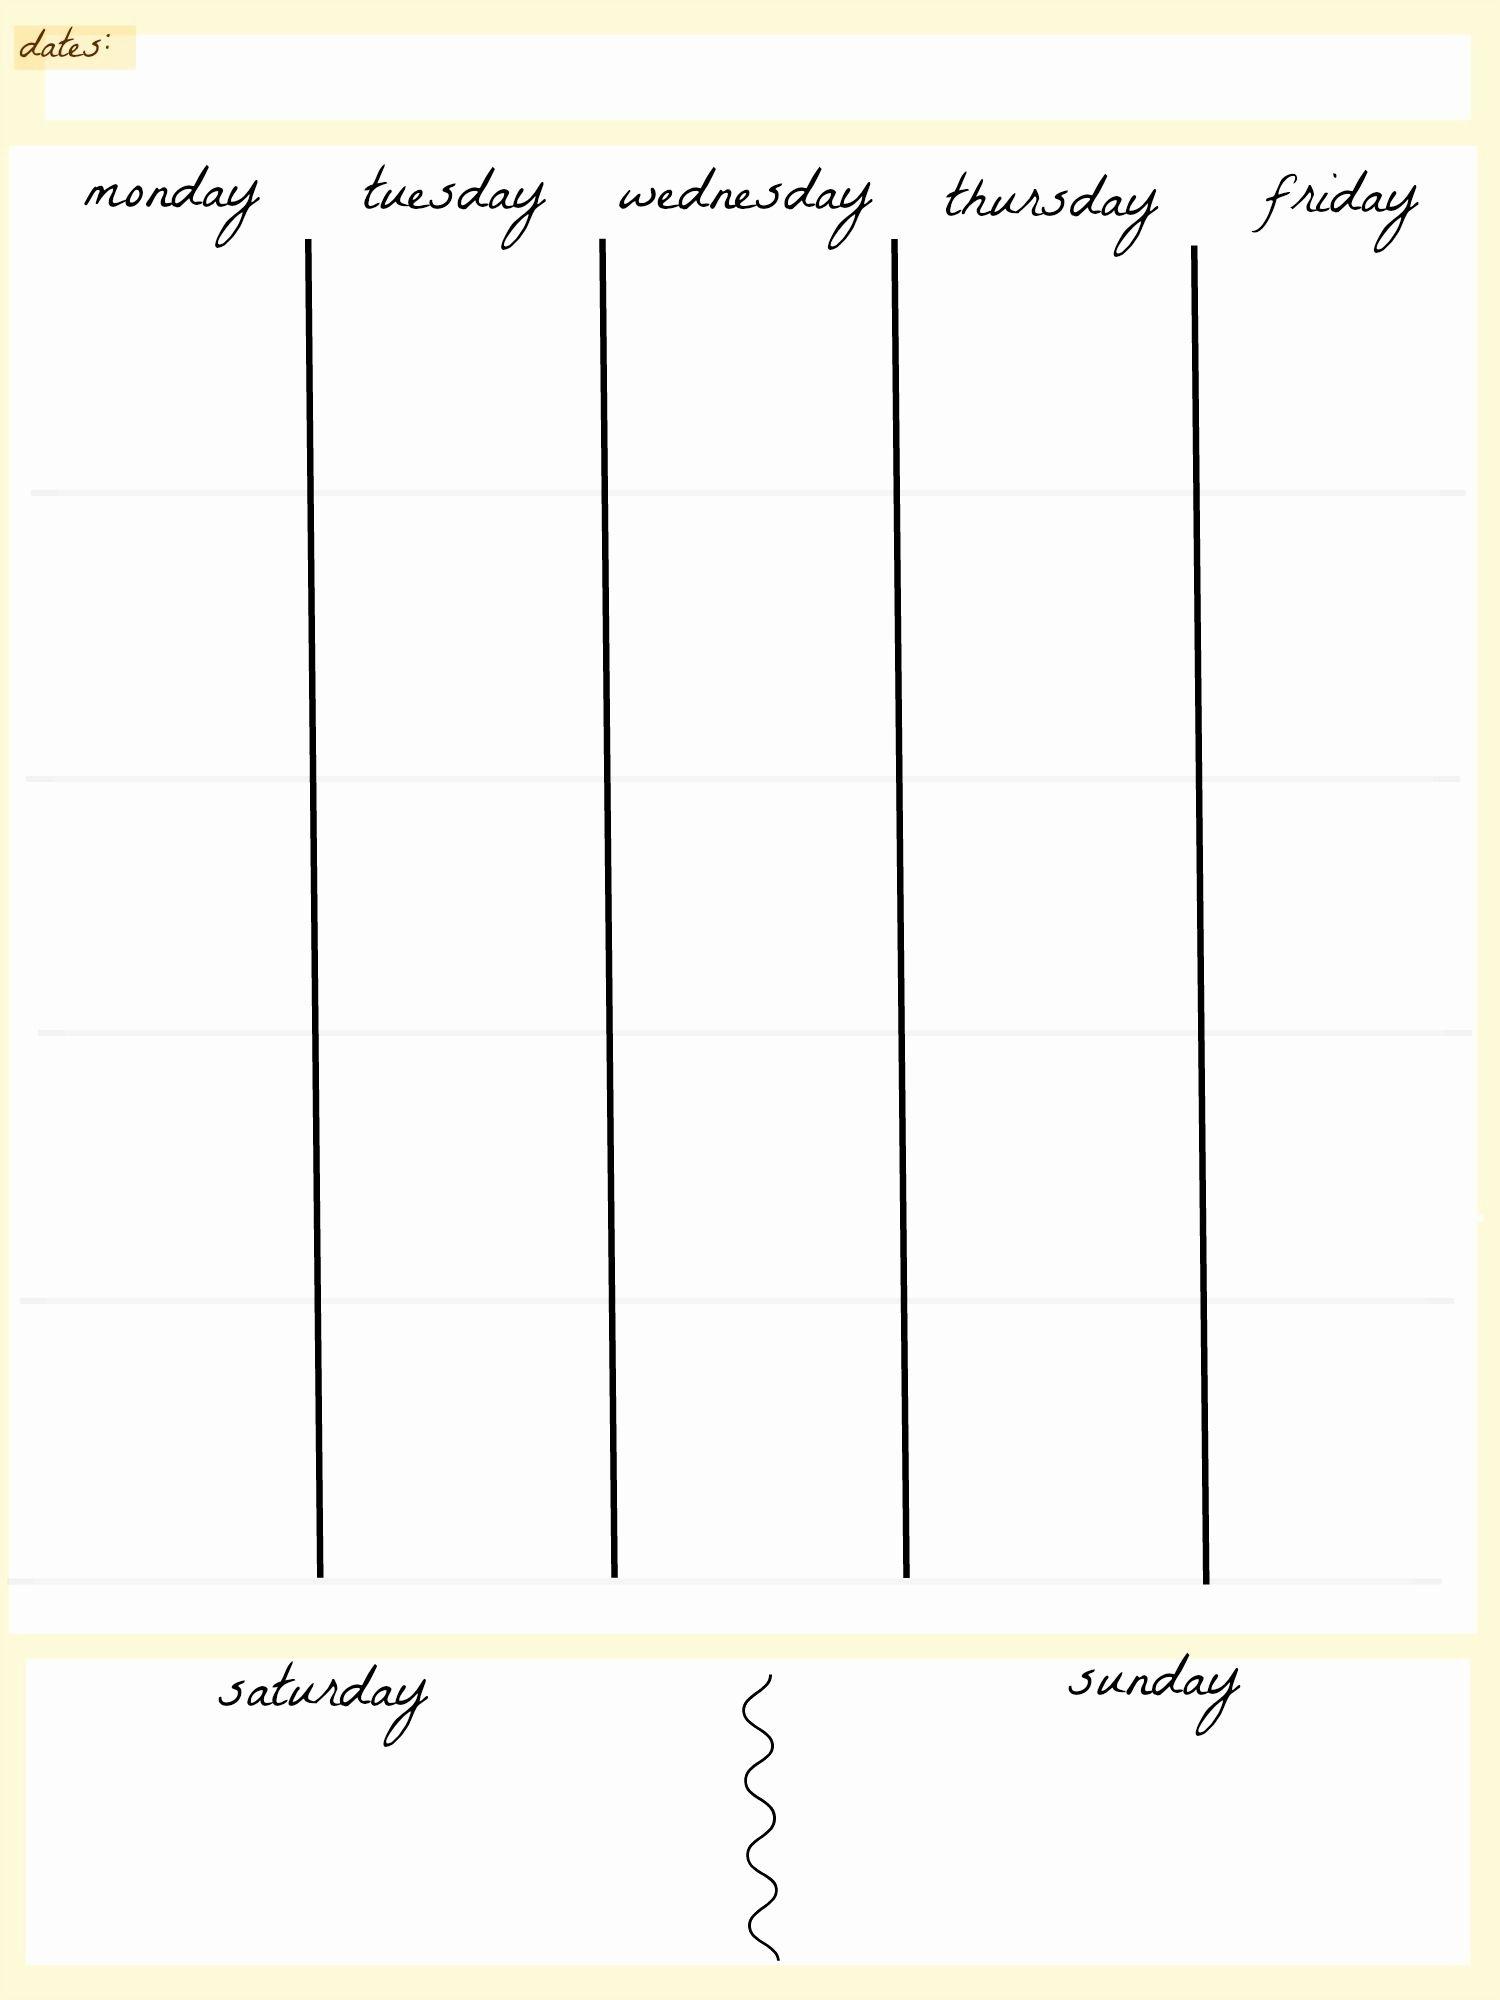 Blank Calendar 5 Day Week | Blank Calendar Template Dowload